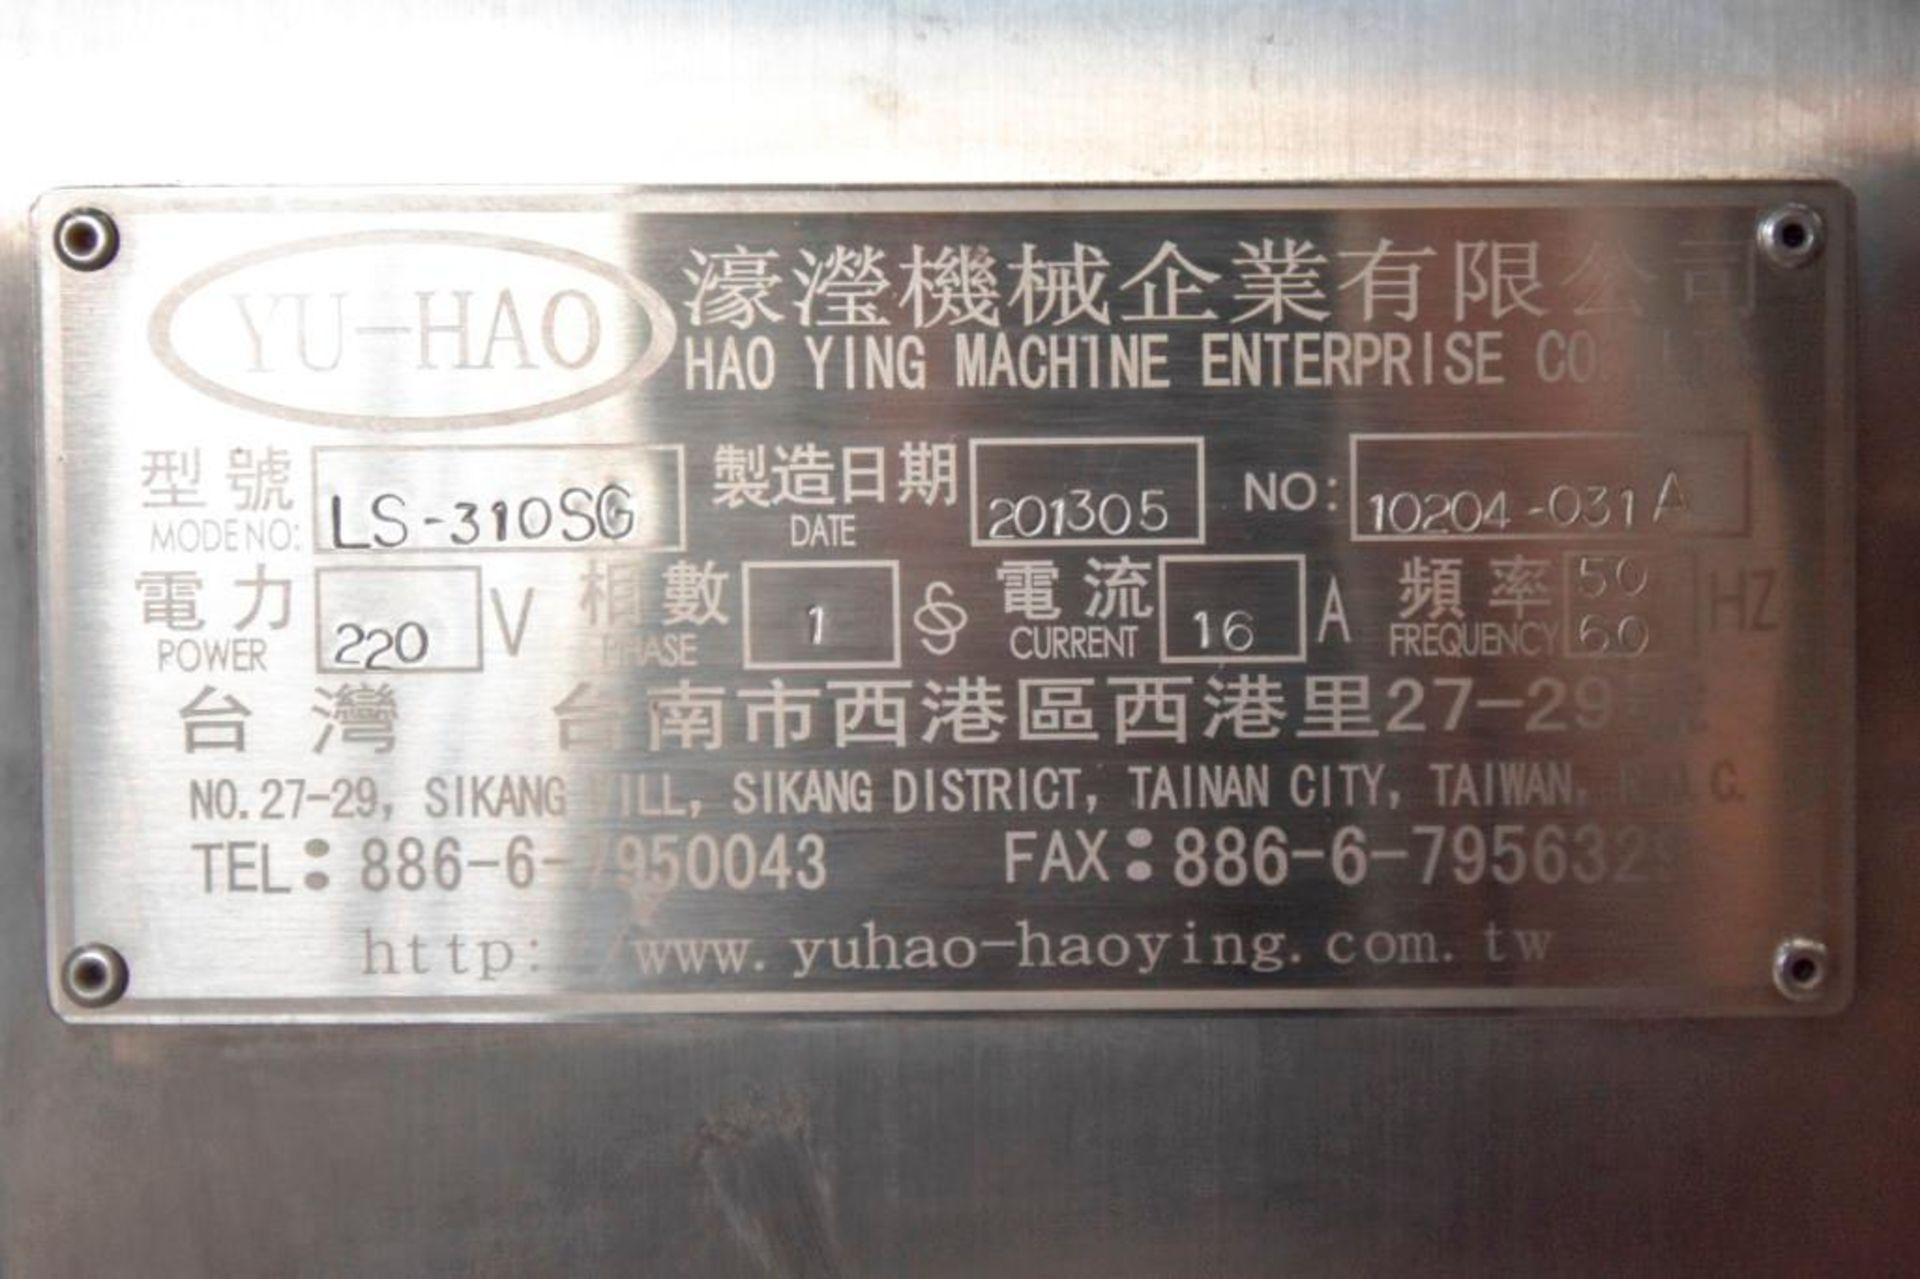 Yu Hao LS-310SG - Image 6 of 15